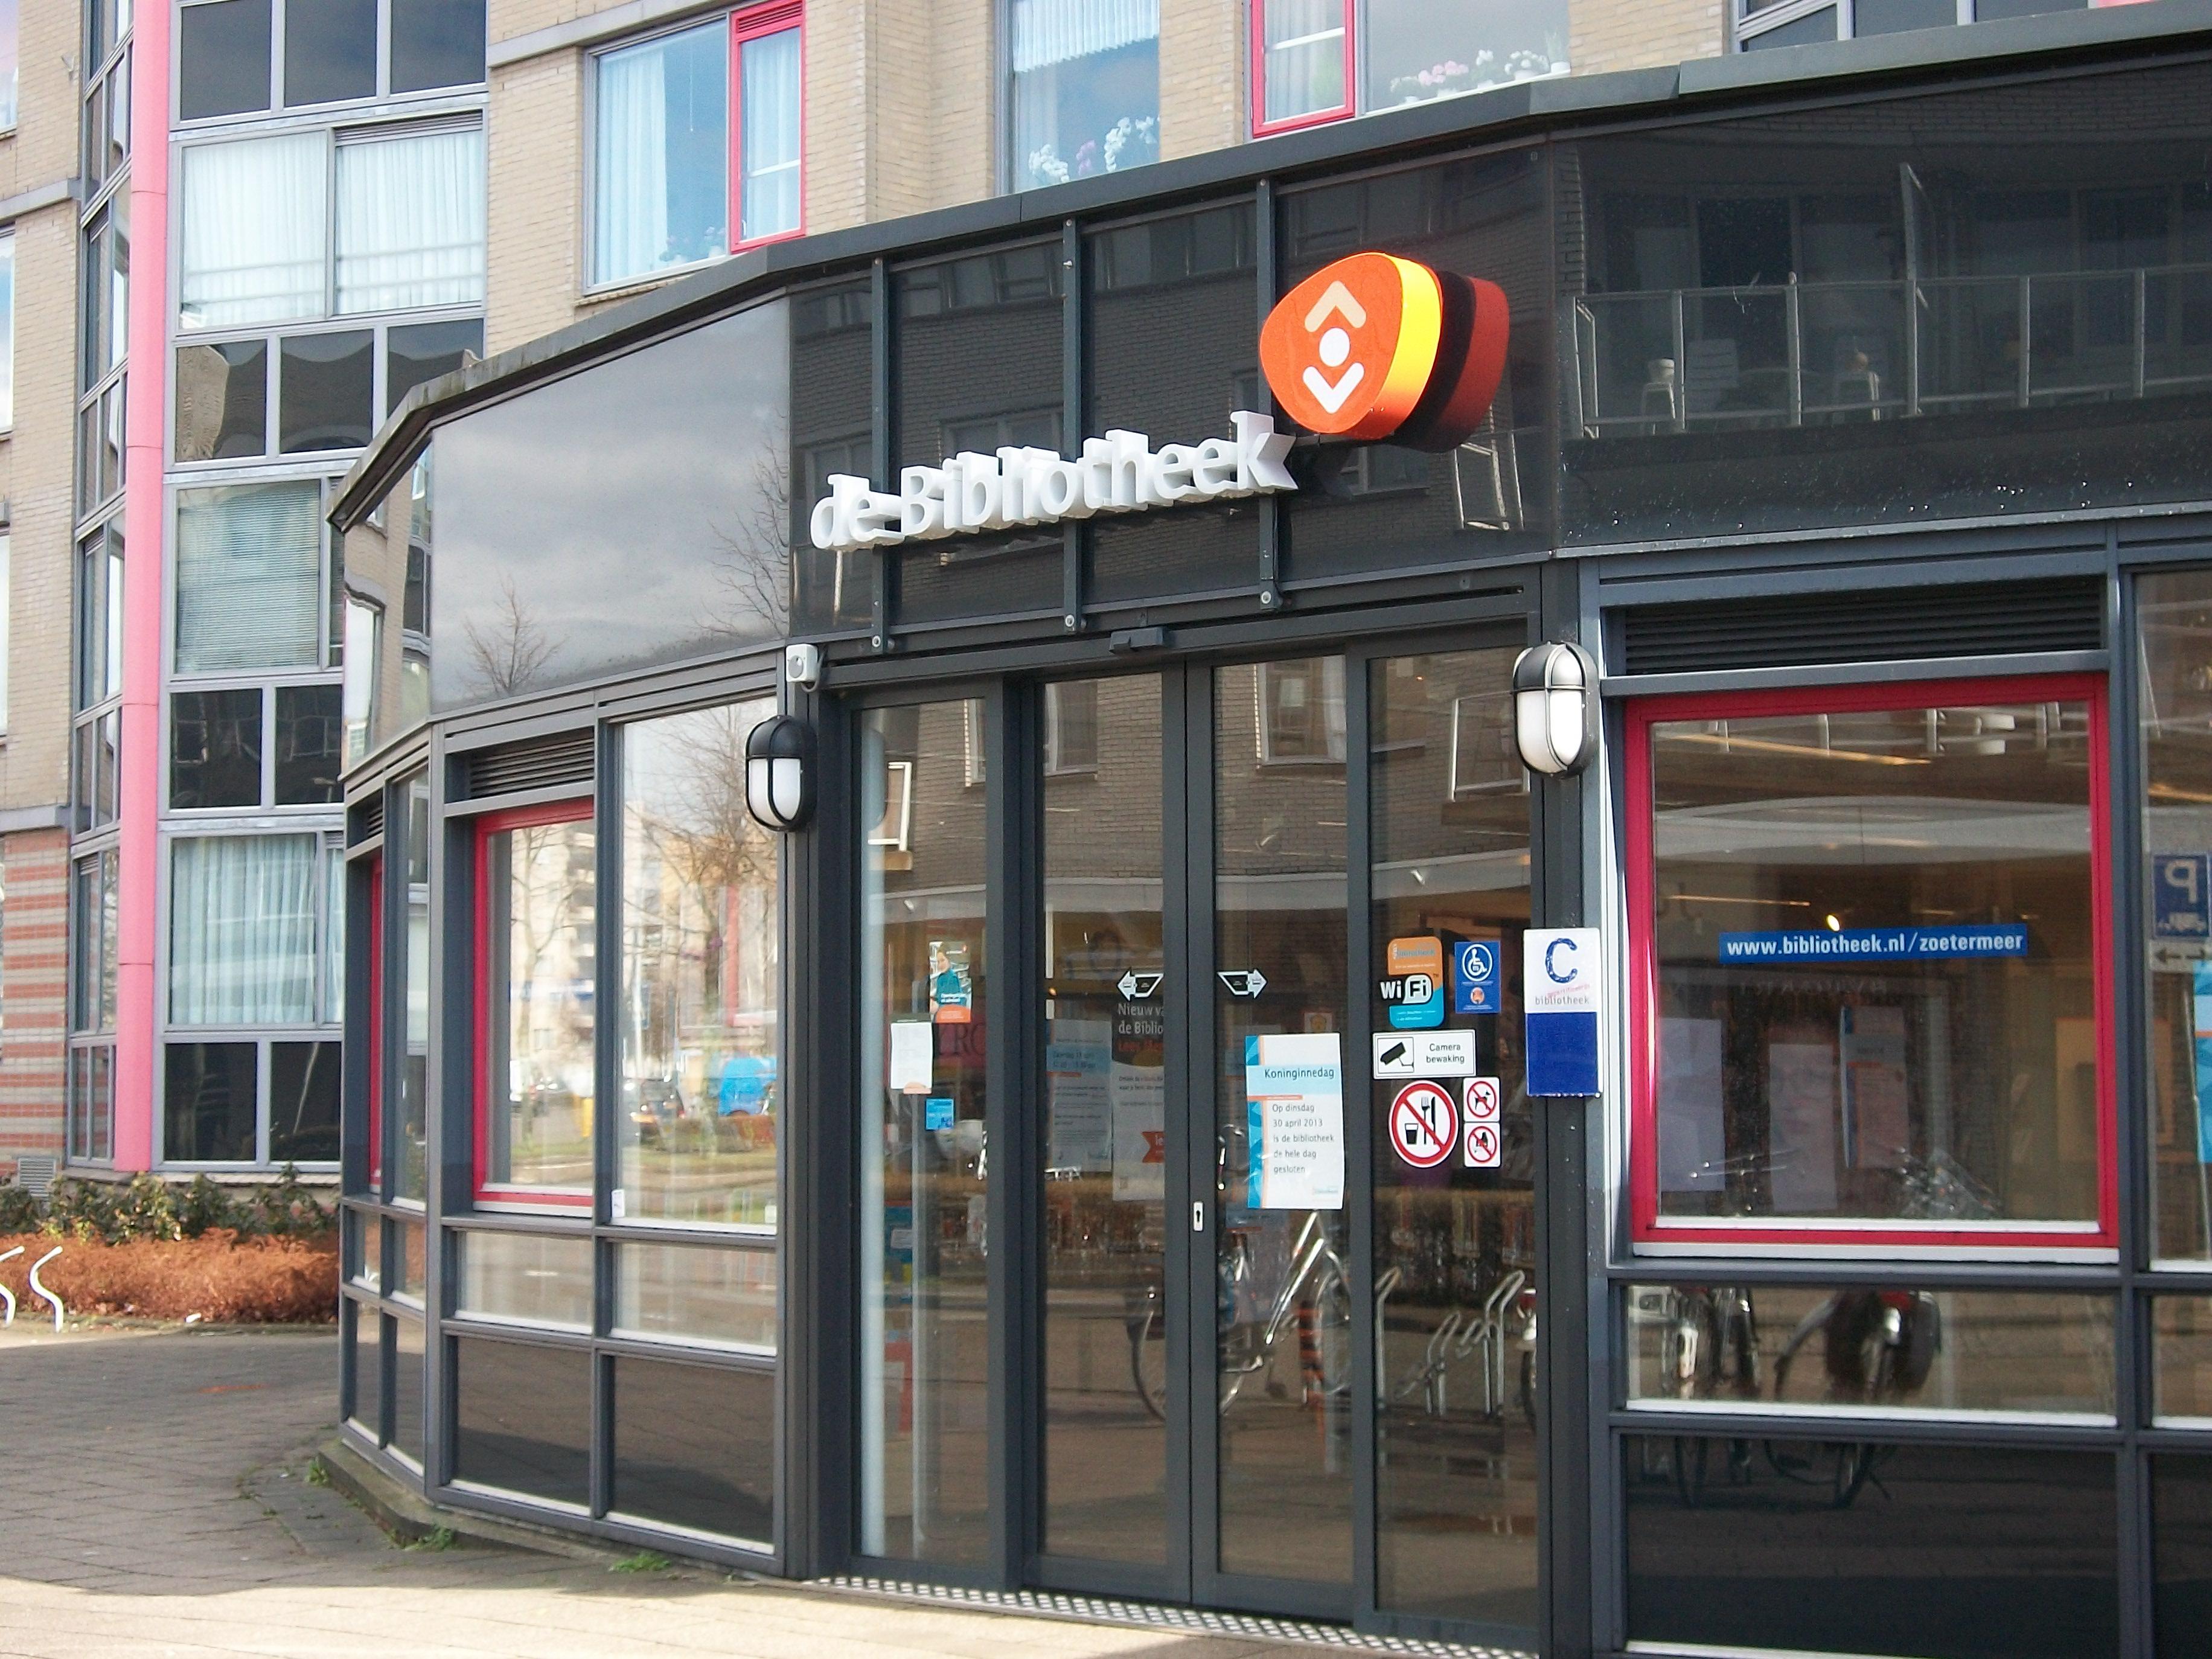 winkelcentrum oosterheem zoetermeer